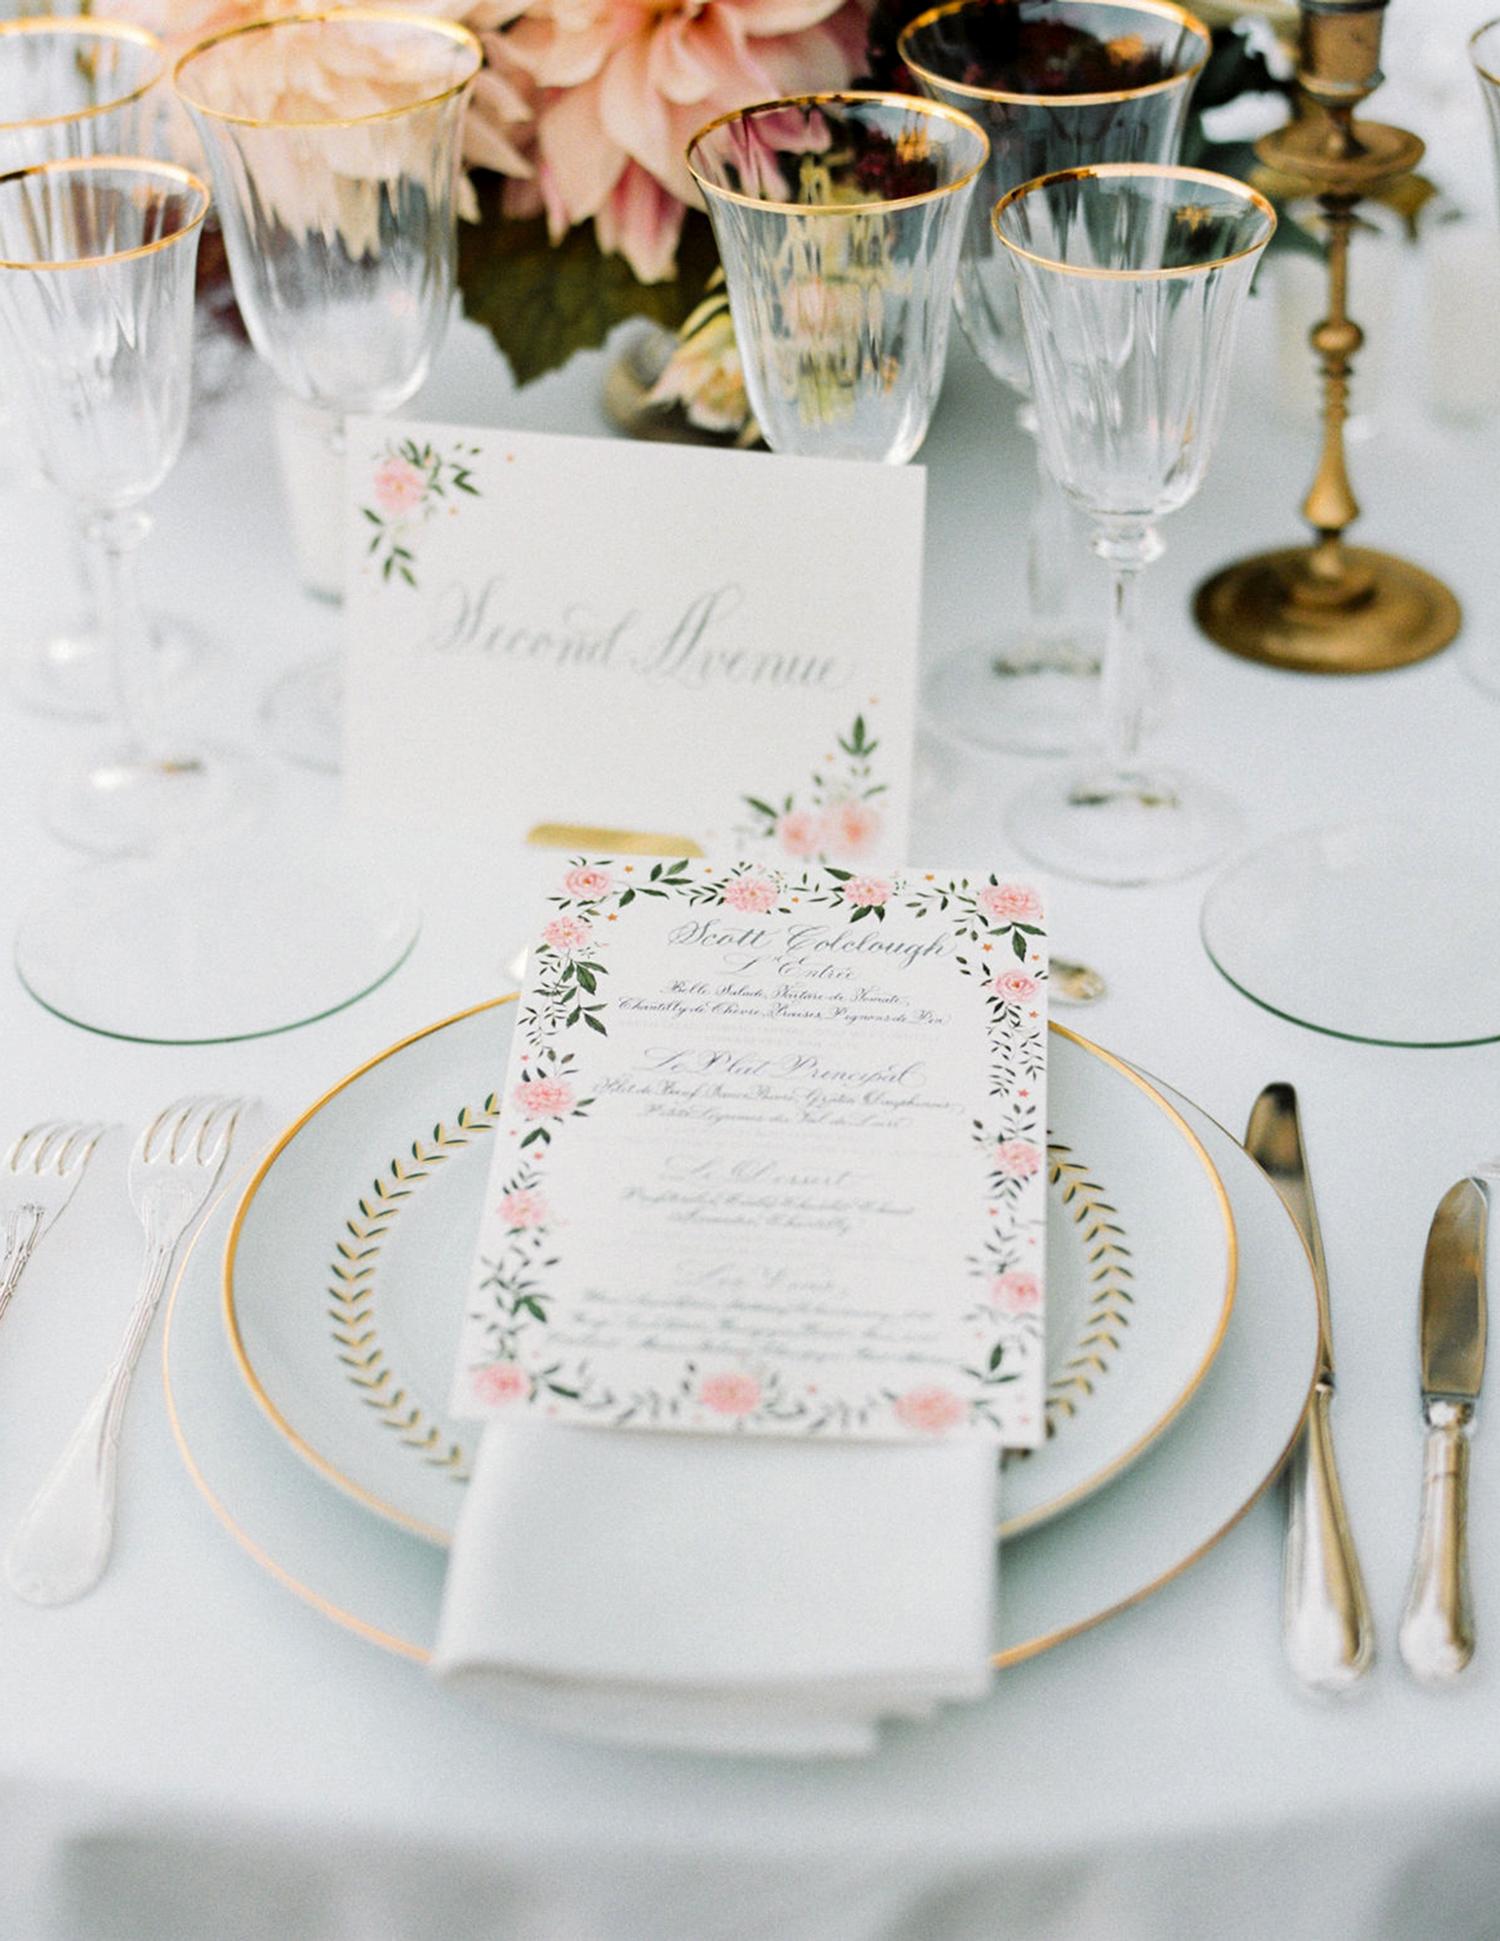 close-up wedding menu on place settings